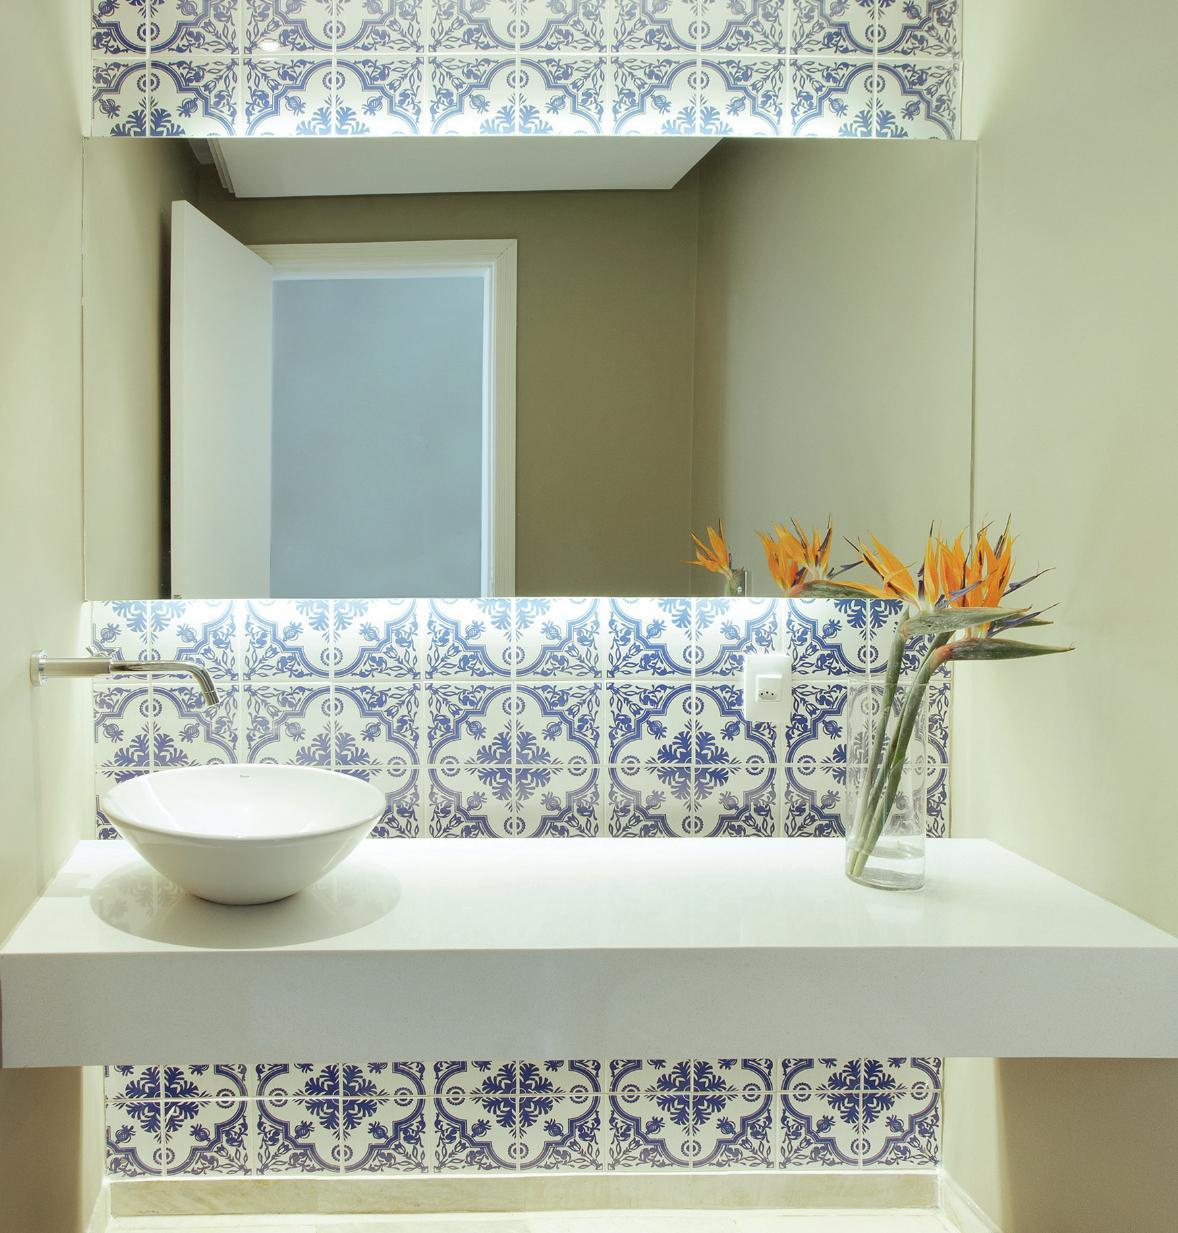 decoracao interiores banheiros pequenos : decoracao interiores banheiros pequenos: Soluções para banheiros pequenos + Pesquisa de Mercado Arquitrecos